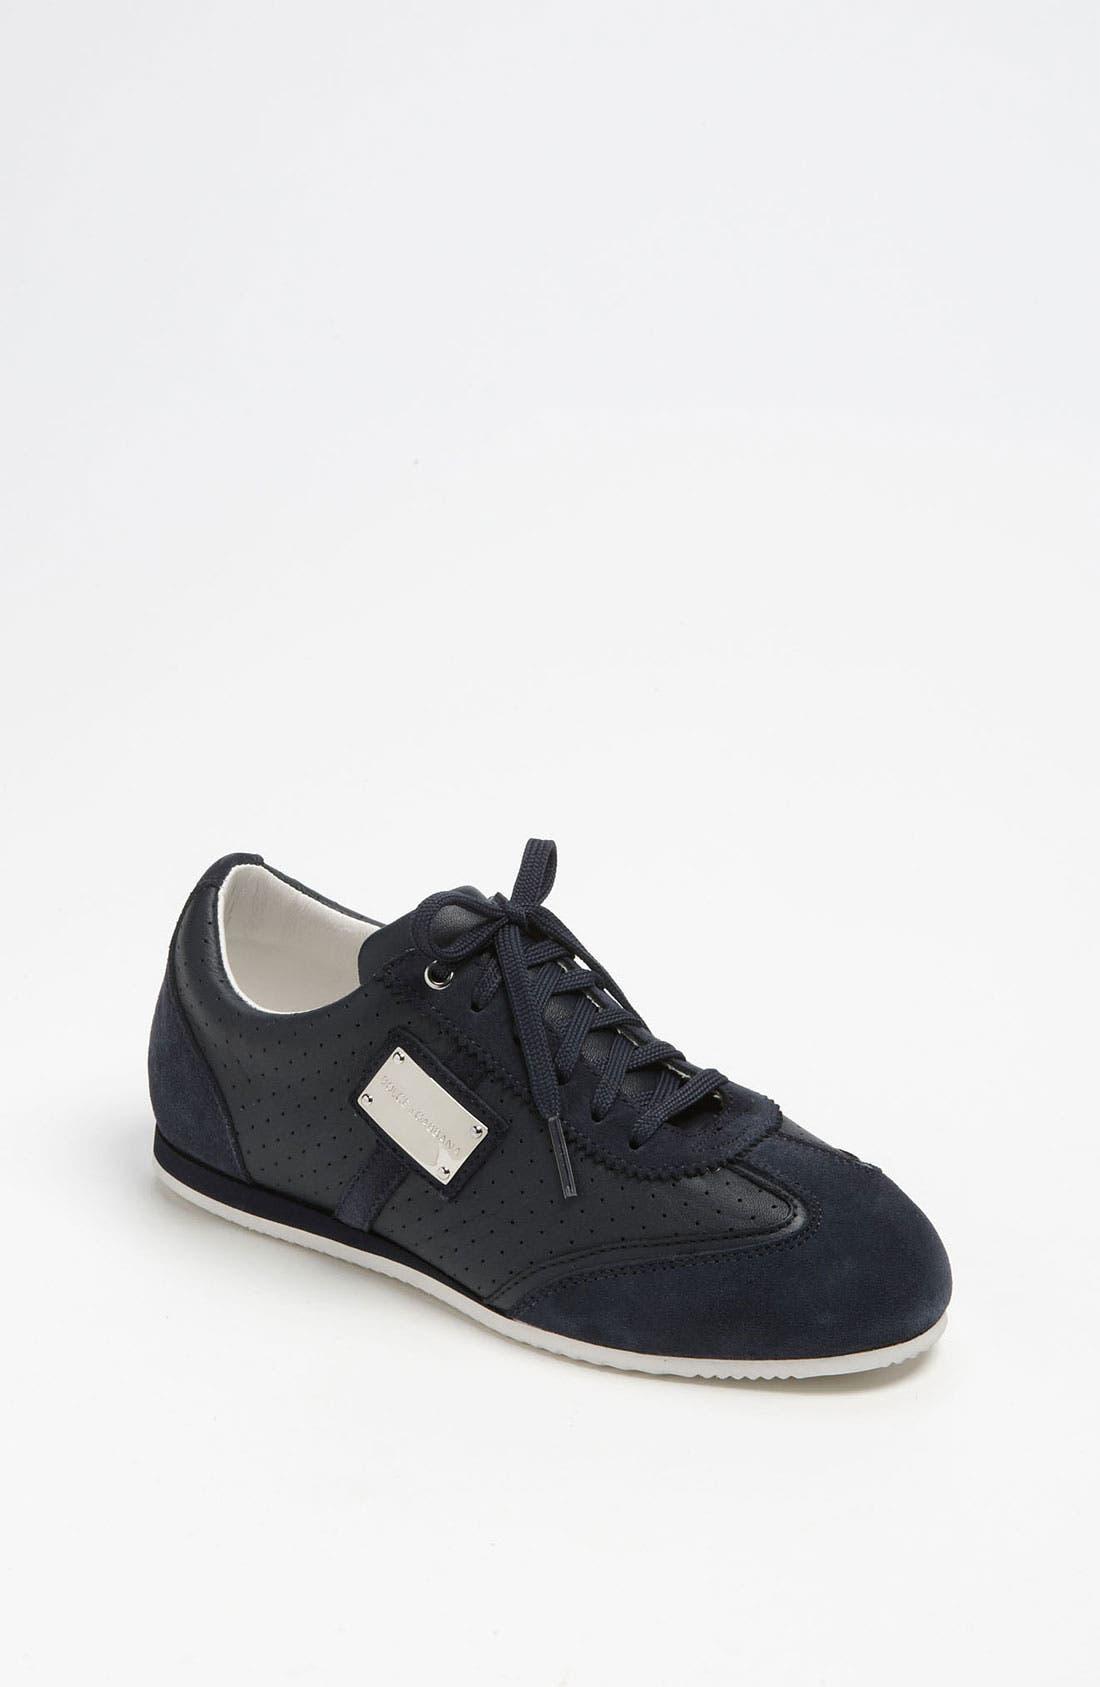 Main Image - Dolce&Gabbana Lace-Up Sneaker (Toddler, Little Kid & Big Kid)